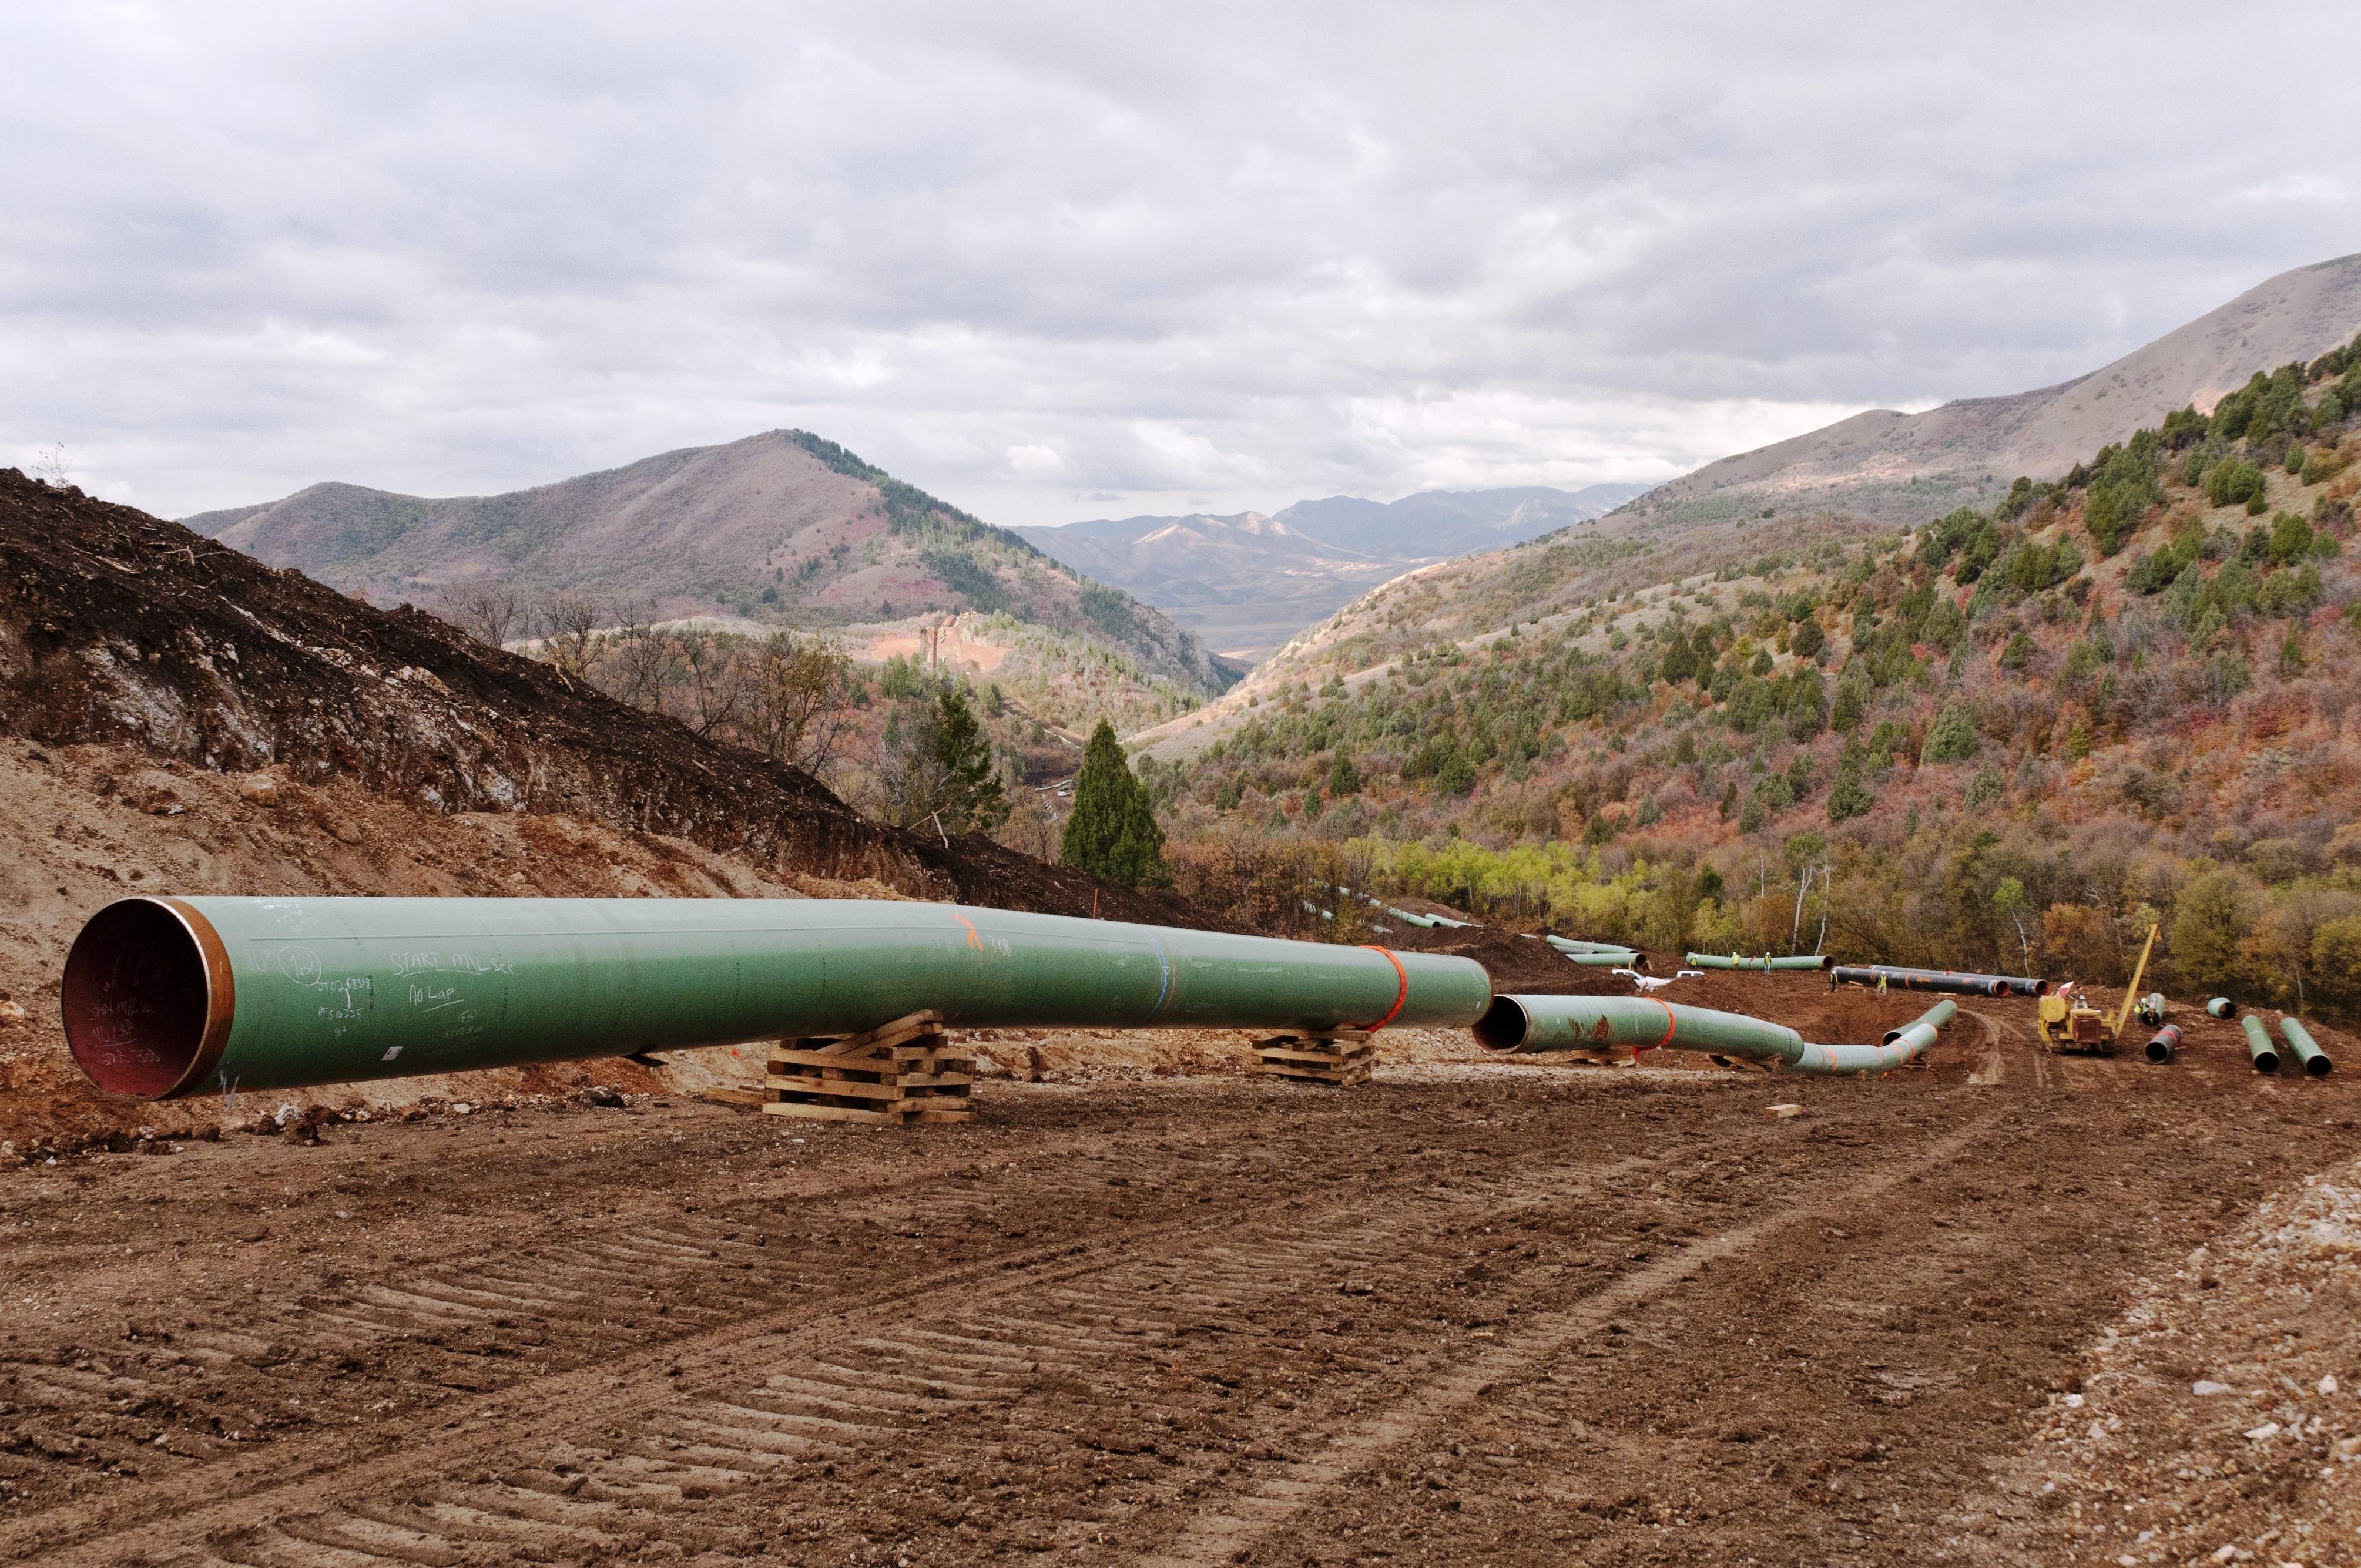 A Kinder Morgan pipeline under construction.